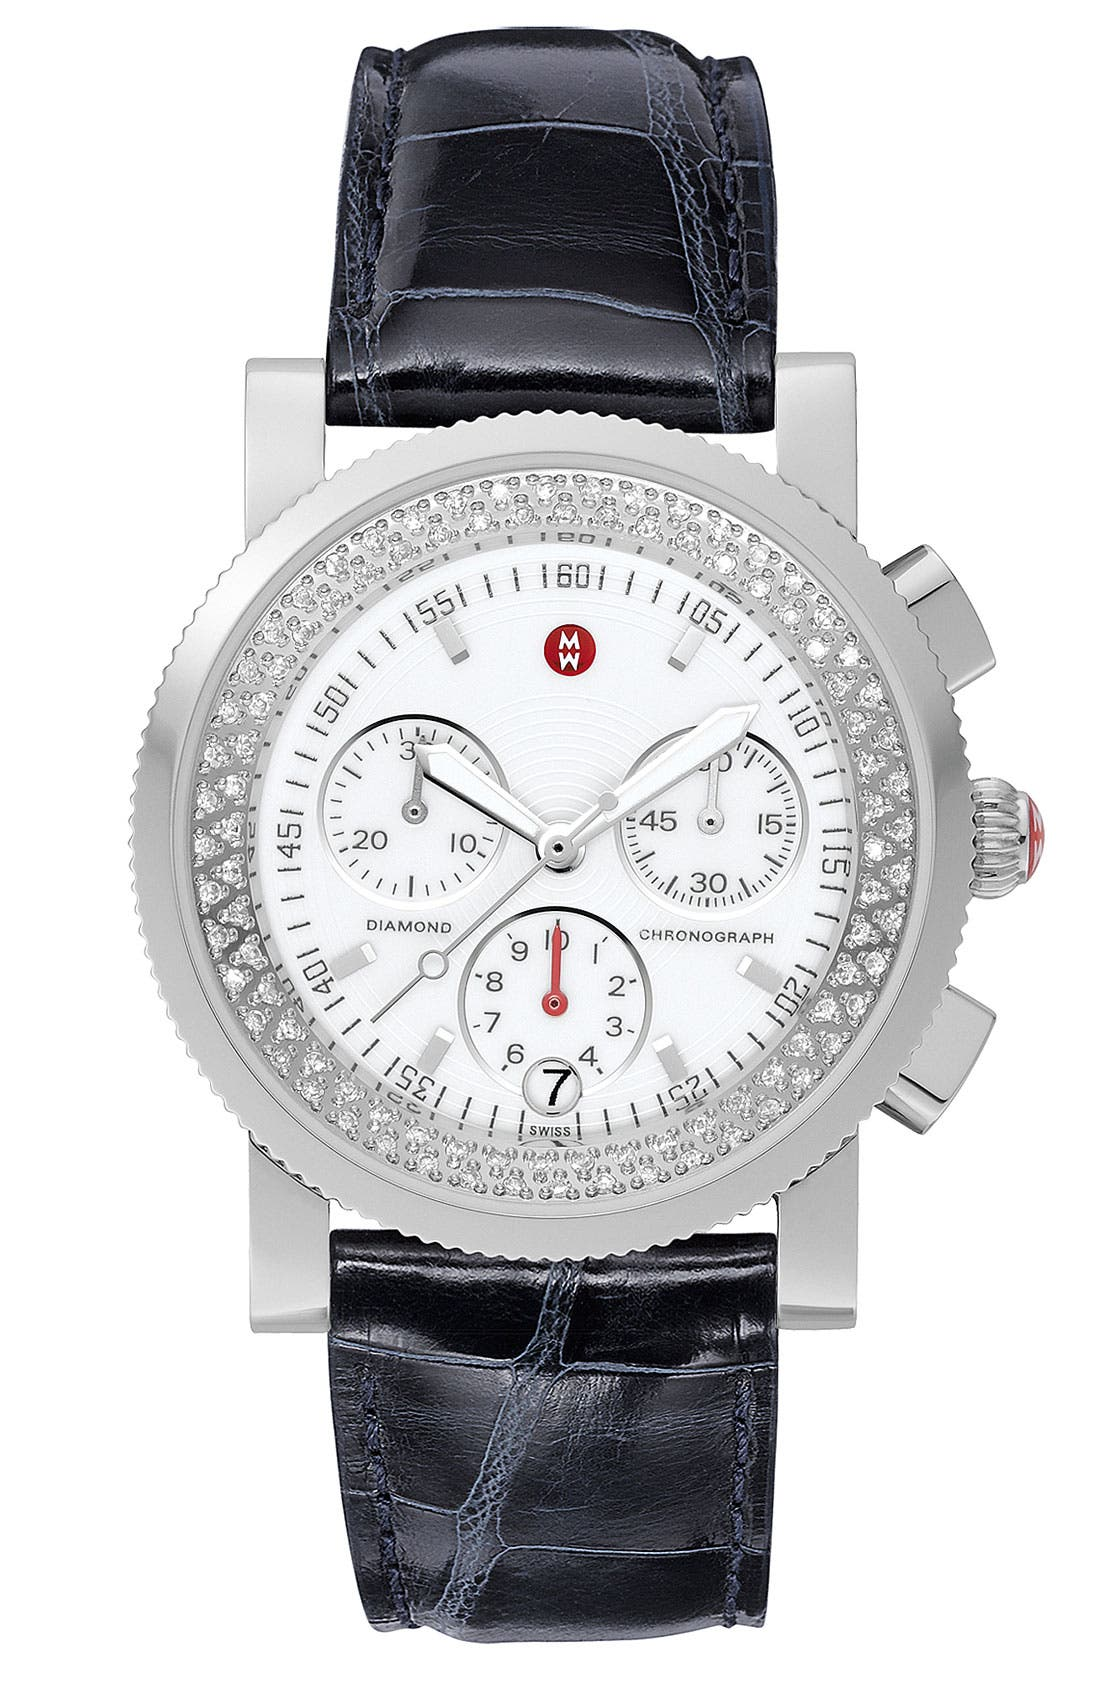 Main Image - MICHELE 'Sport Sail' Diamond Watch Case & 20mm Black Alligator Strap